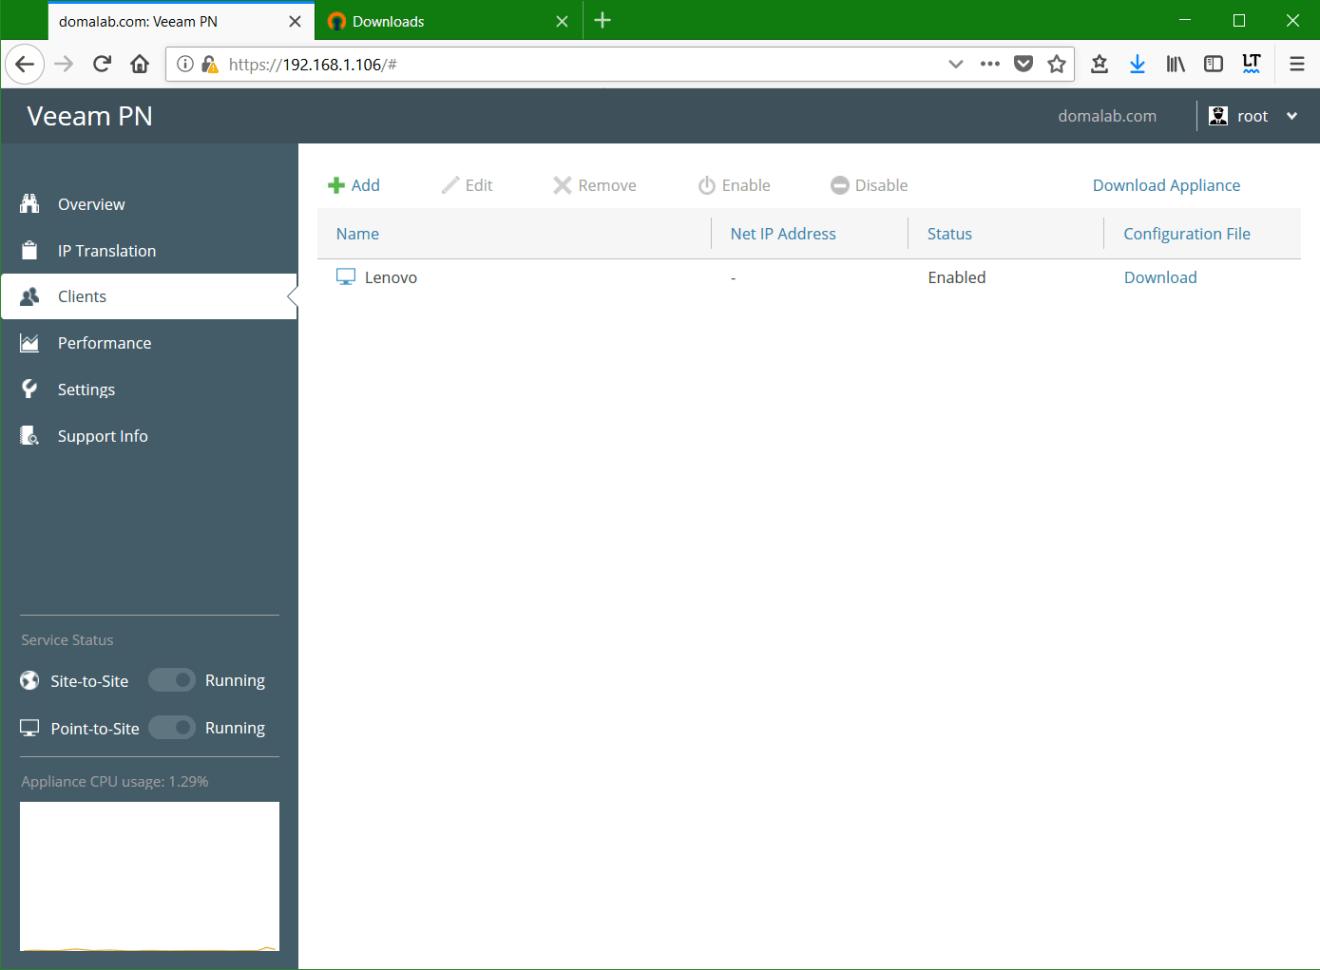 domalab.com Veeam PN Client list